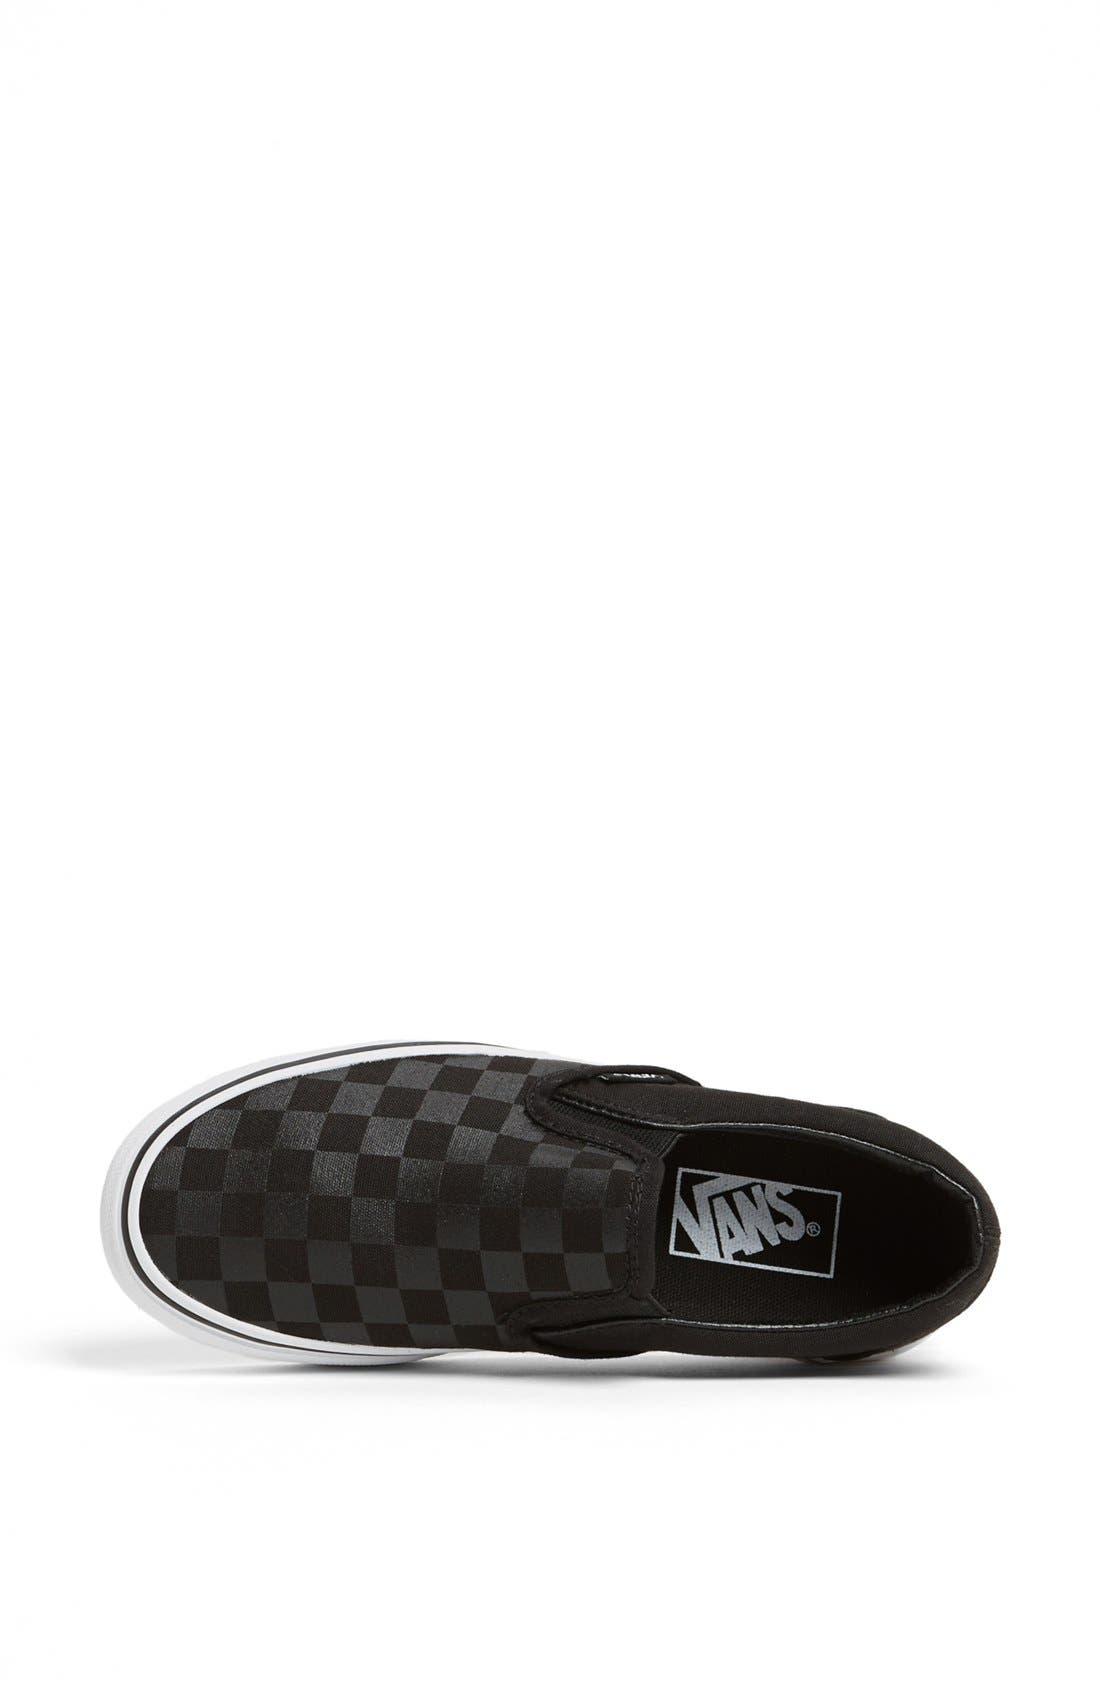 Alternate Image 3  - Vans 'Classic' Sneaker (Women)